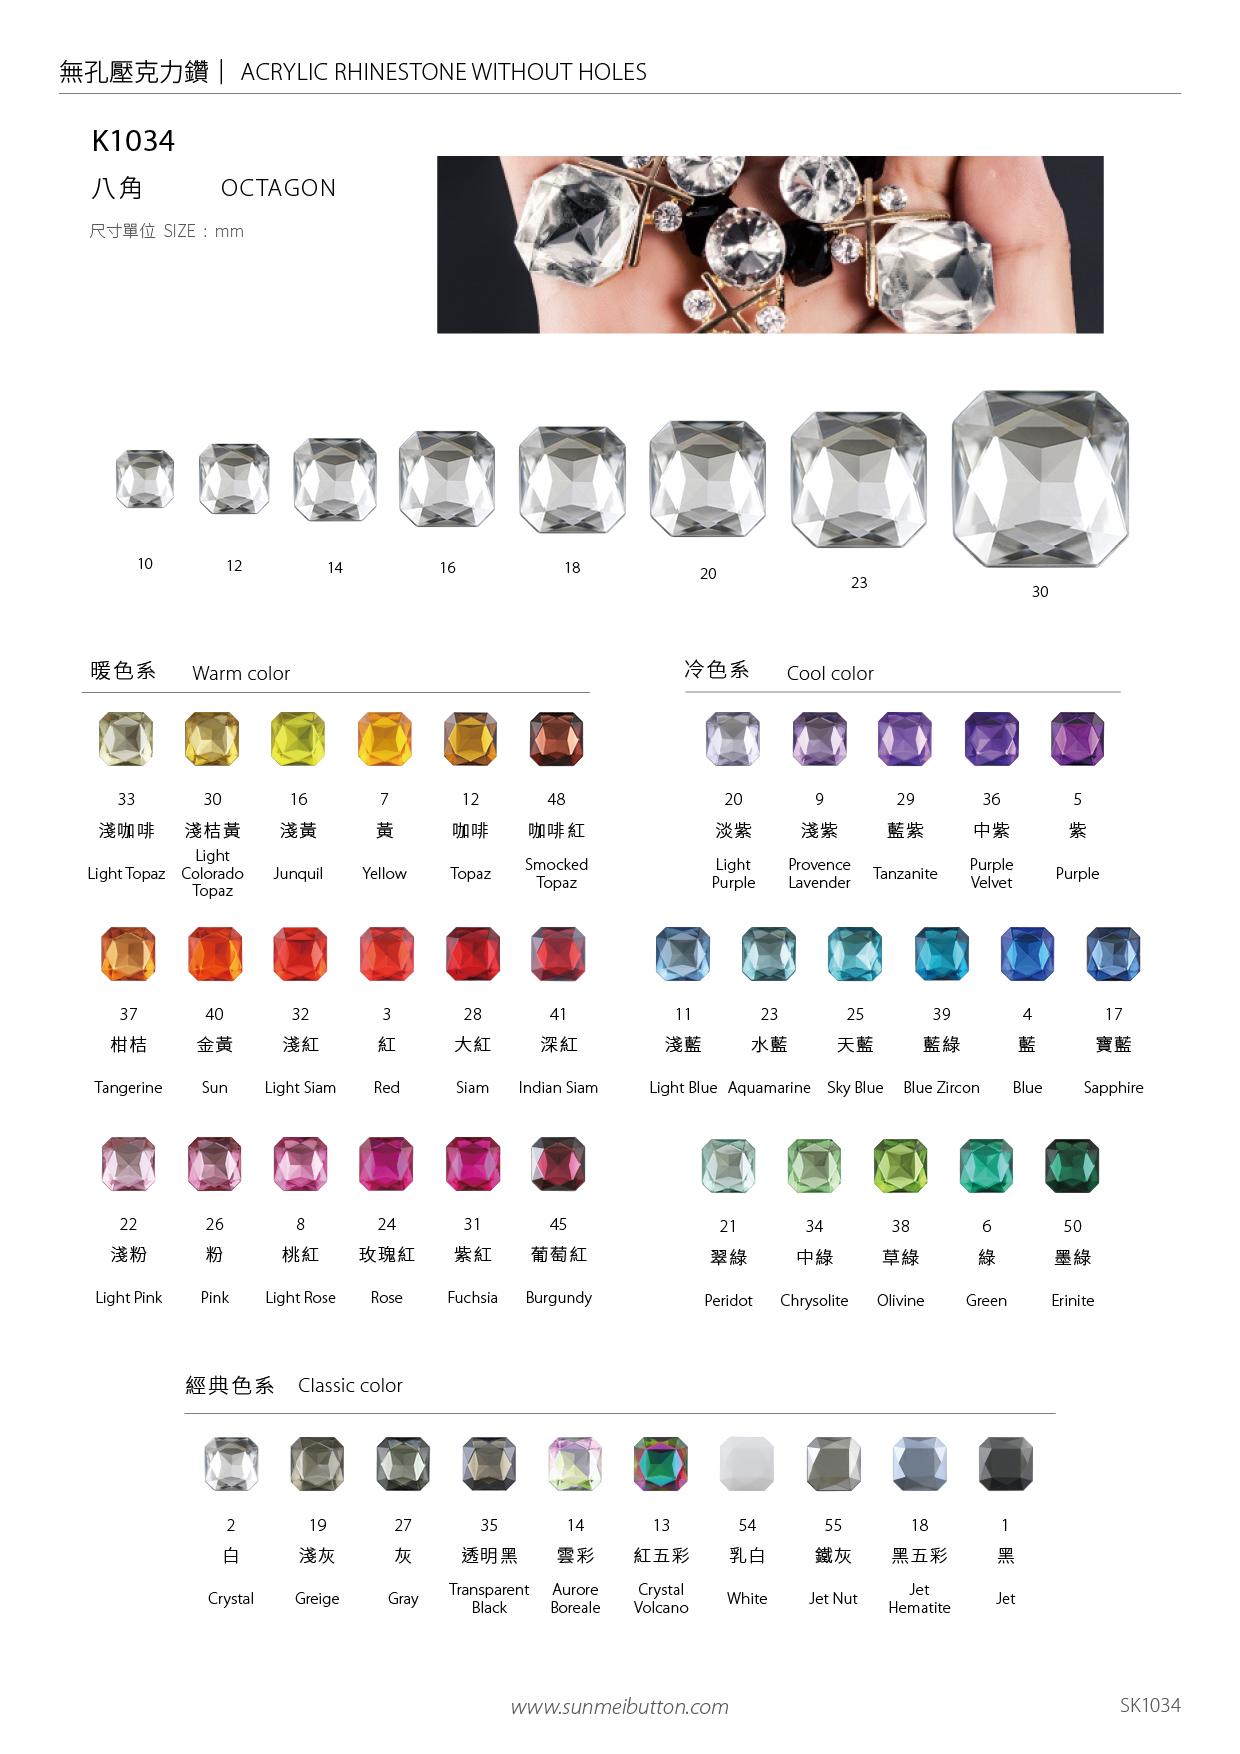 MIT Grosir Batu Mewah Persegi Kristal Akrilik Warna-warni Ujung Belakang Berlian Imitasi Desainer untuk Dekorasi Anting Kalung